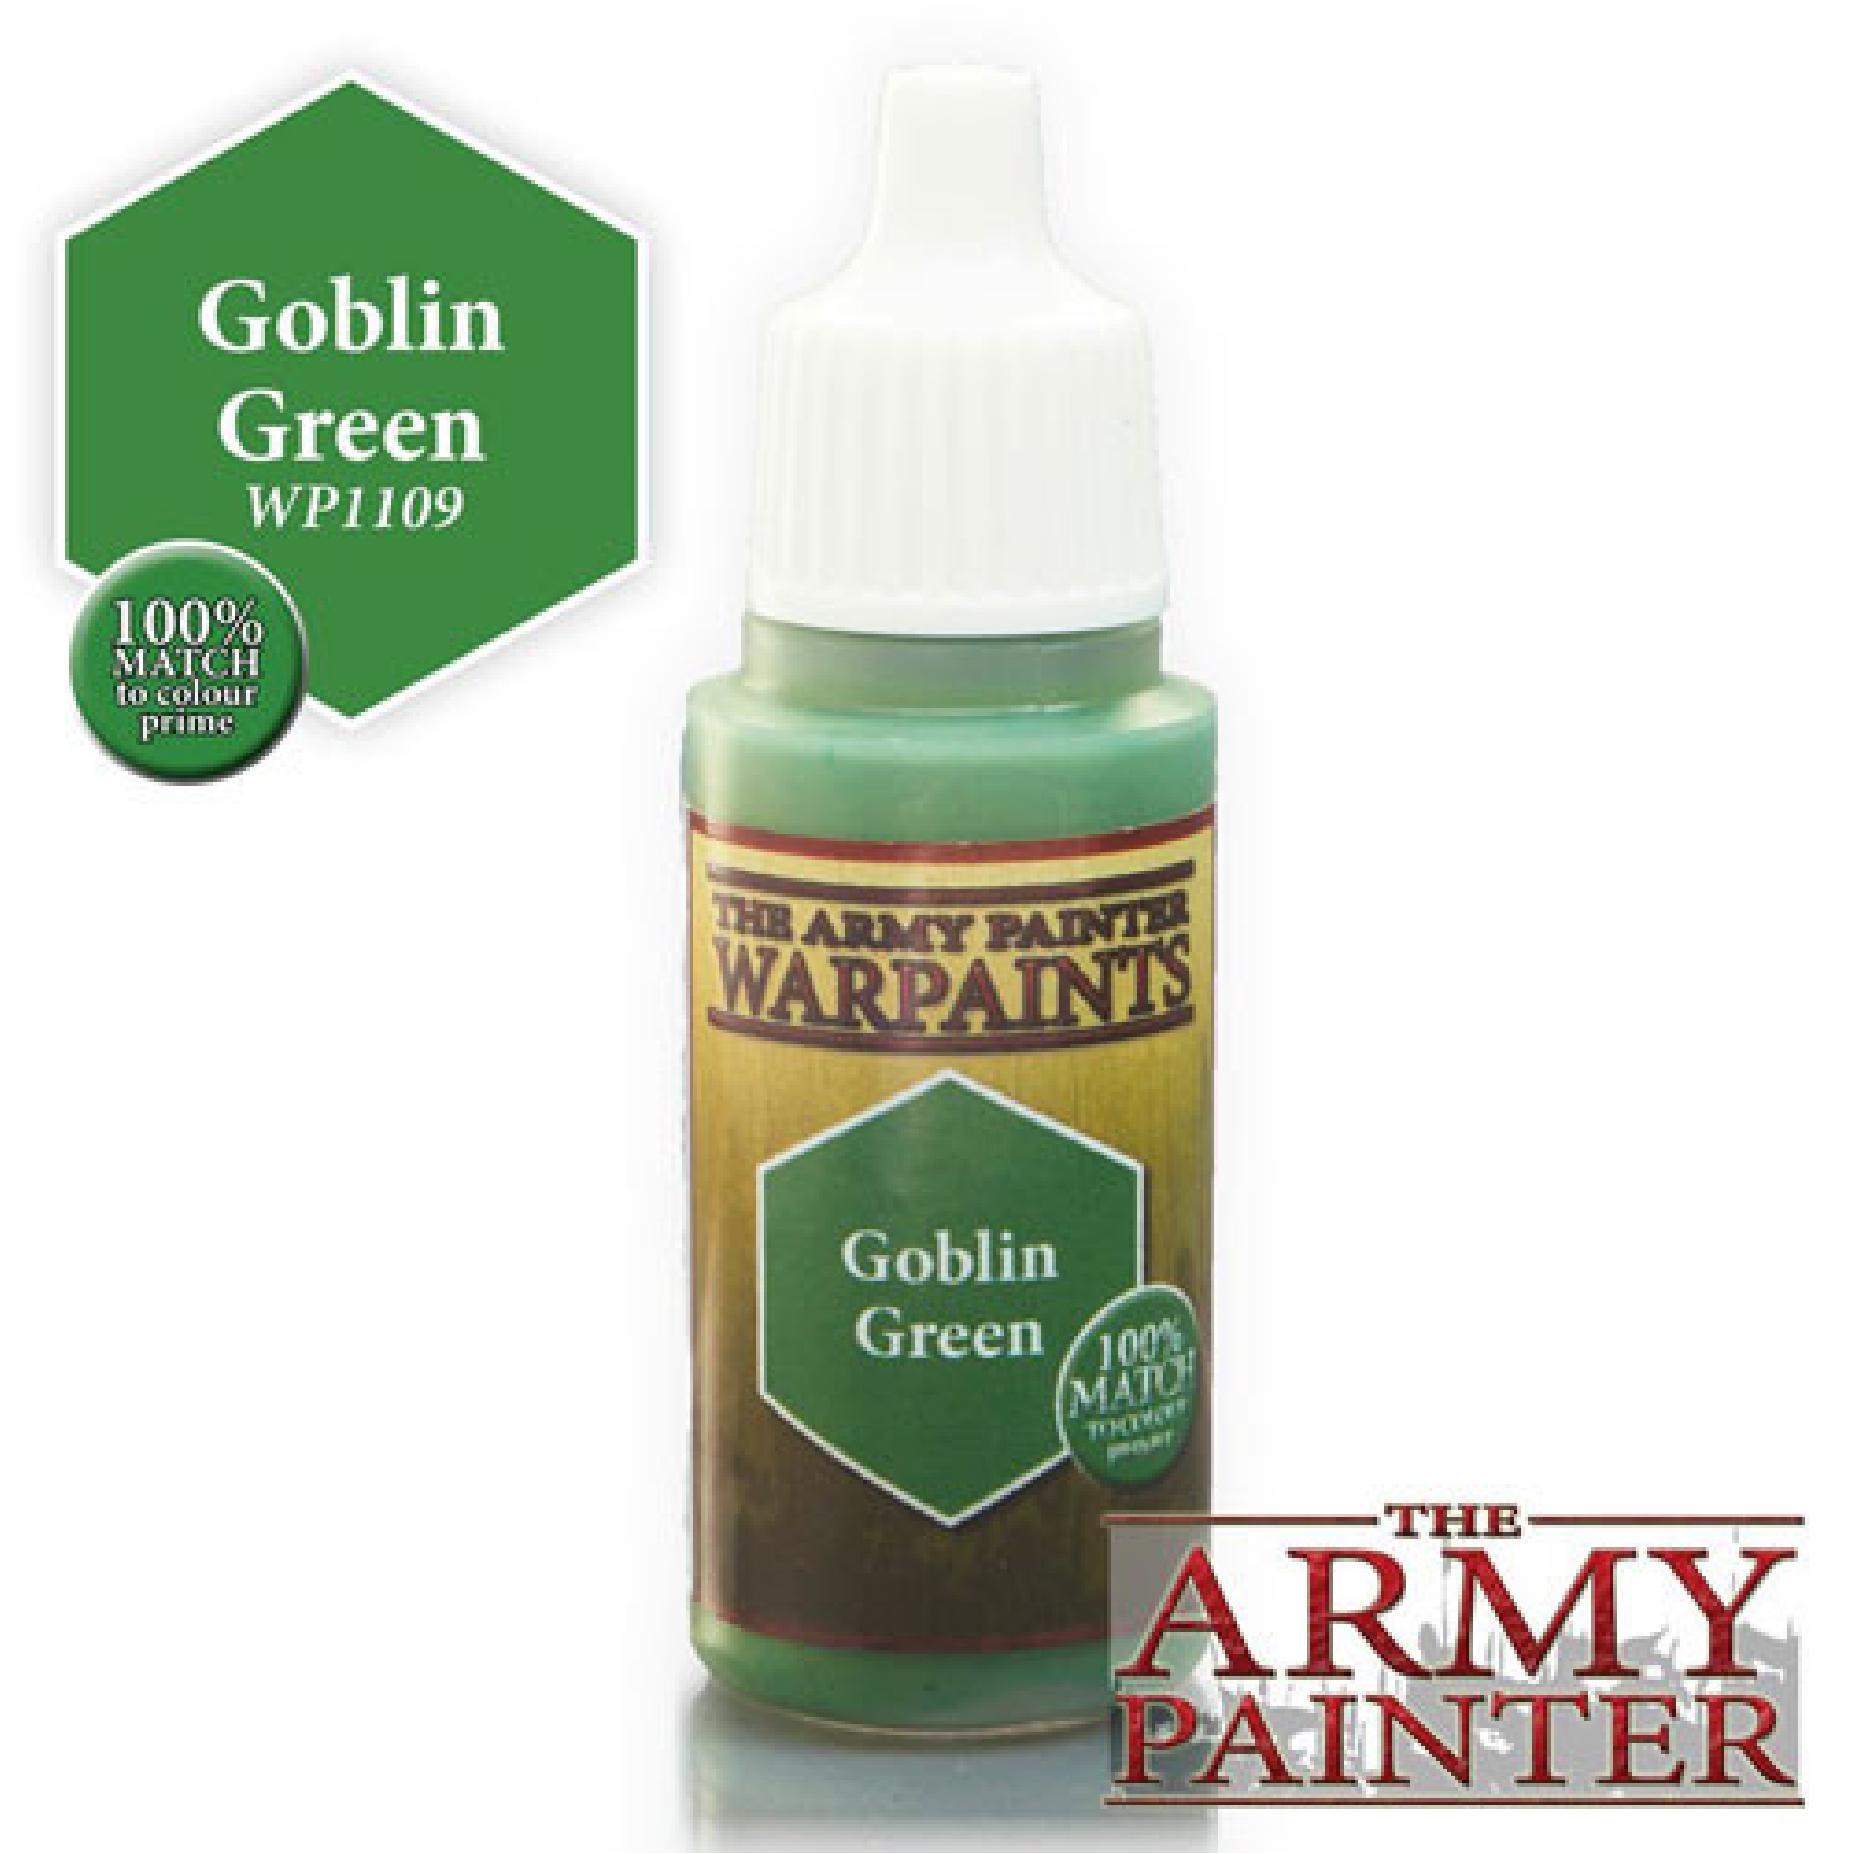 Army Painter Warpaint - Goblin Green